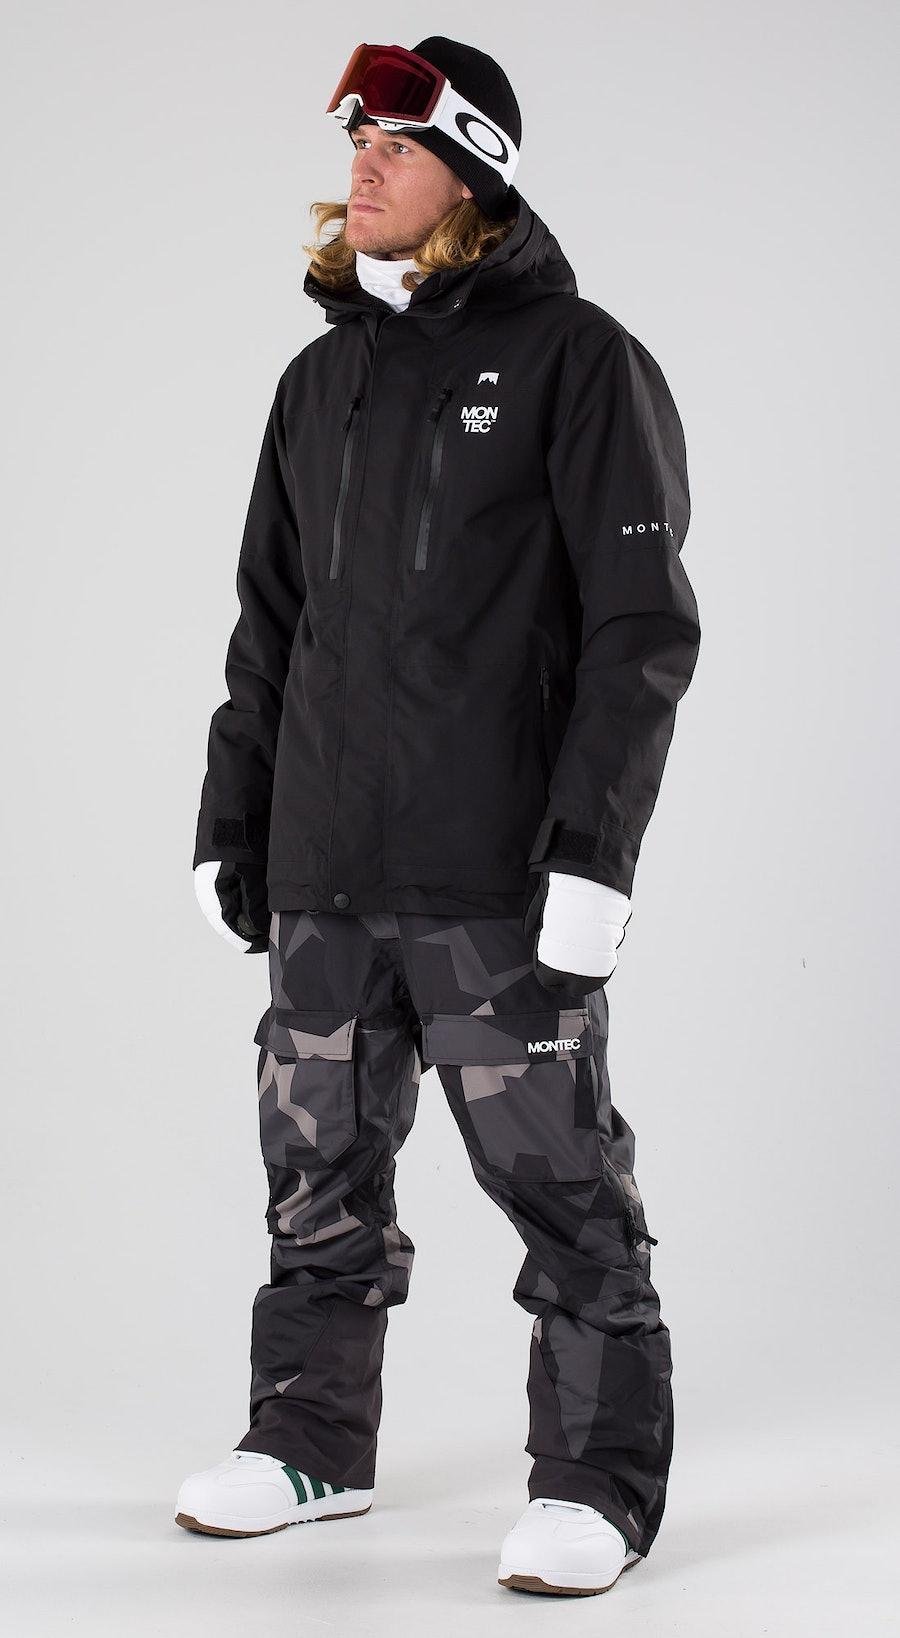 Montec Fawk Black Snowboardkläder Multi